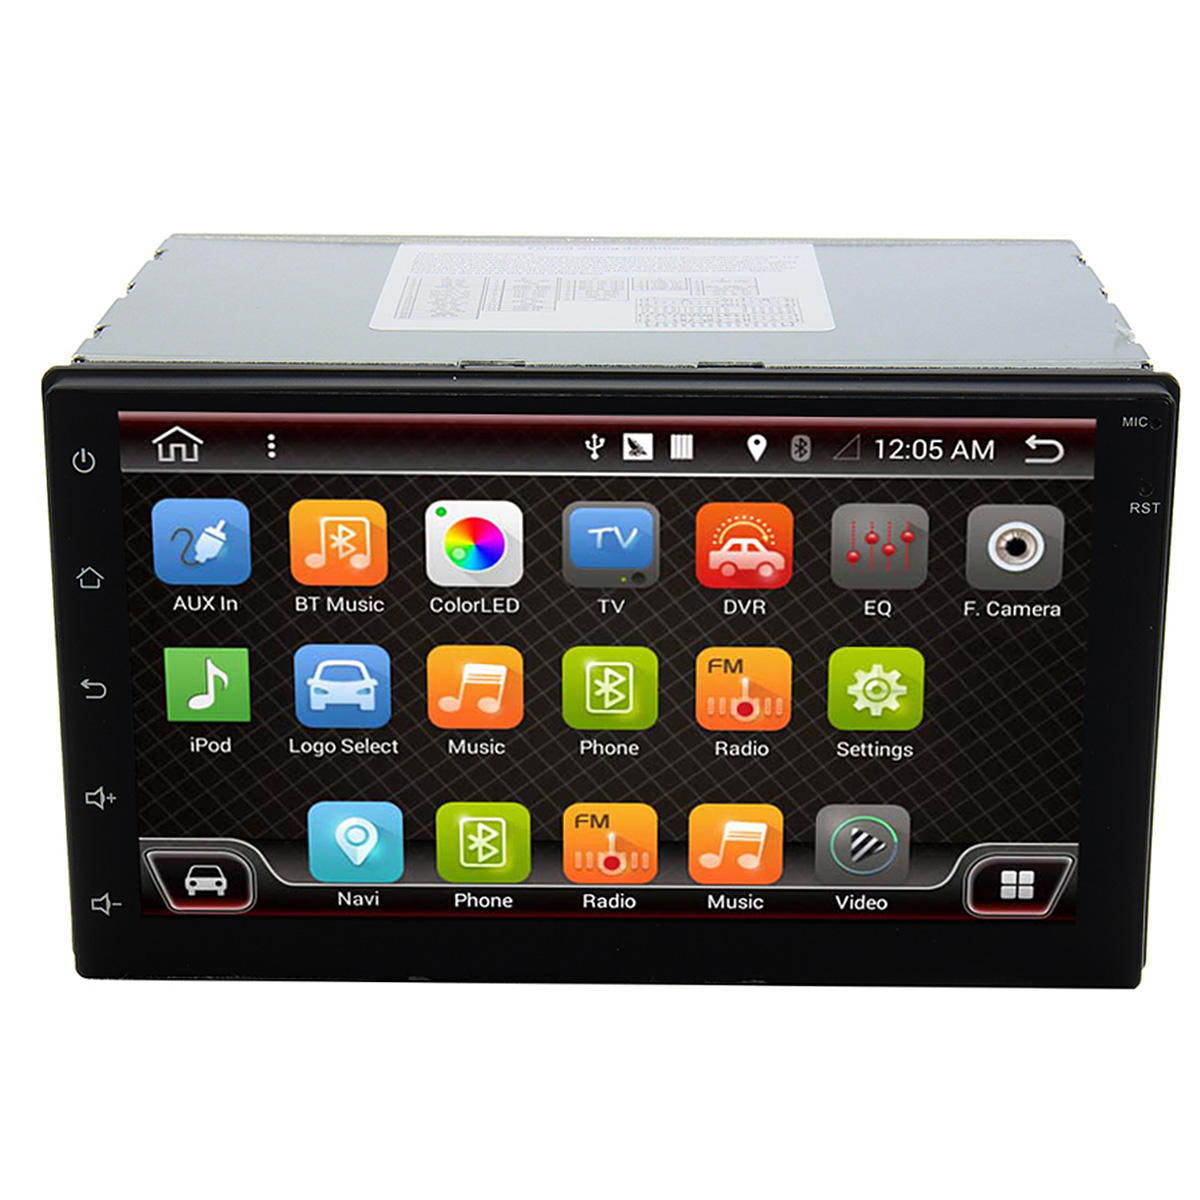 7 Zoll Android 6.0 Double 2 DIN Sat Navigationsgerät GPS Navigation Stereo DAB